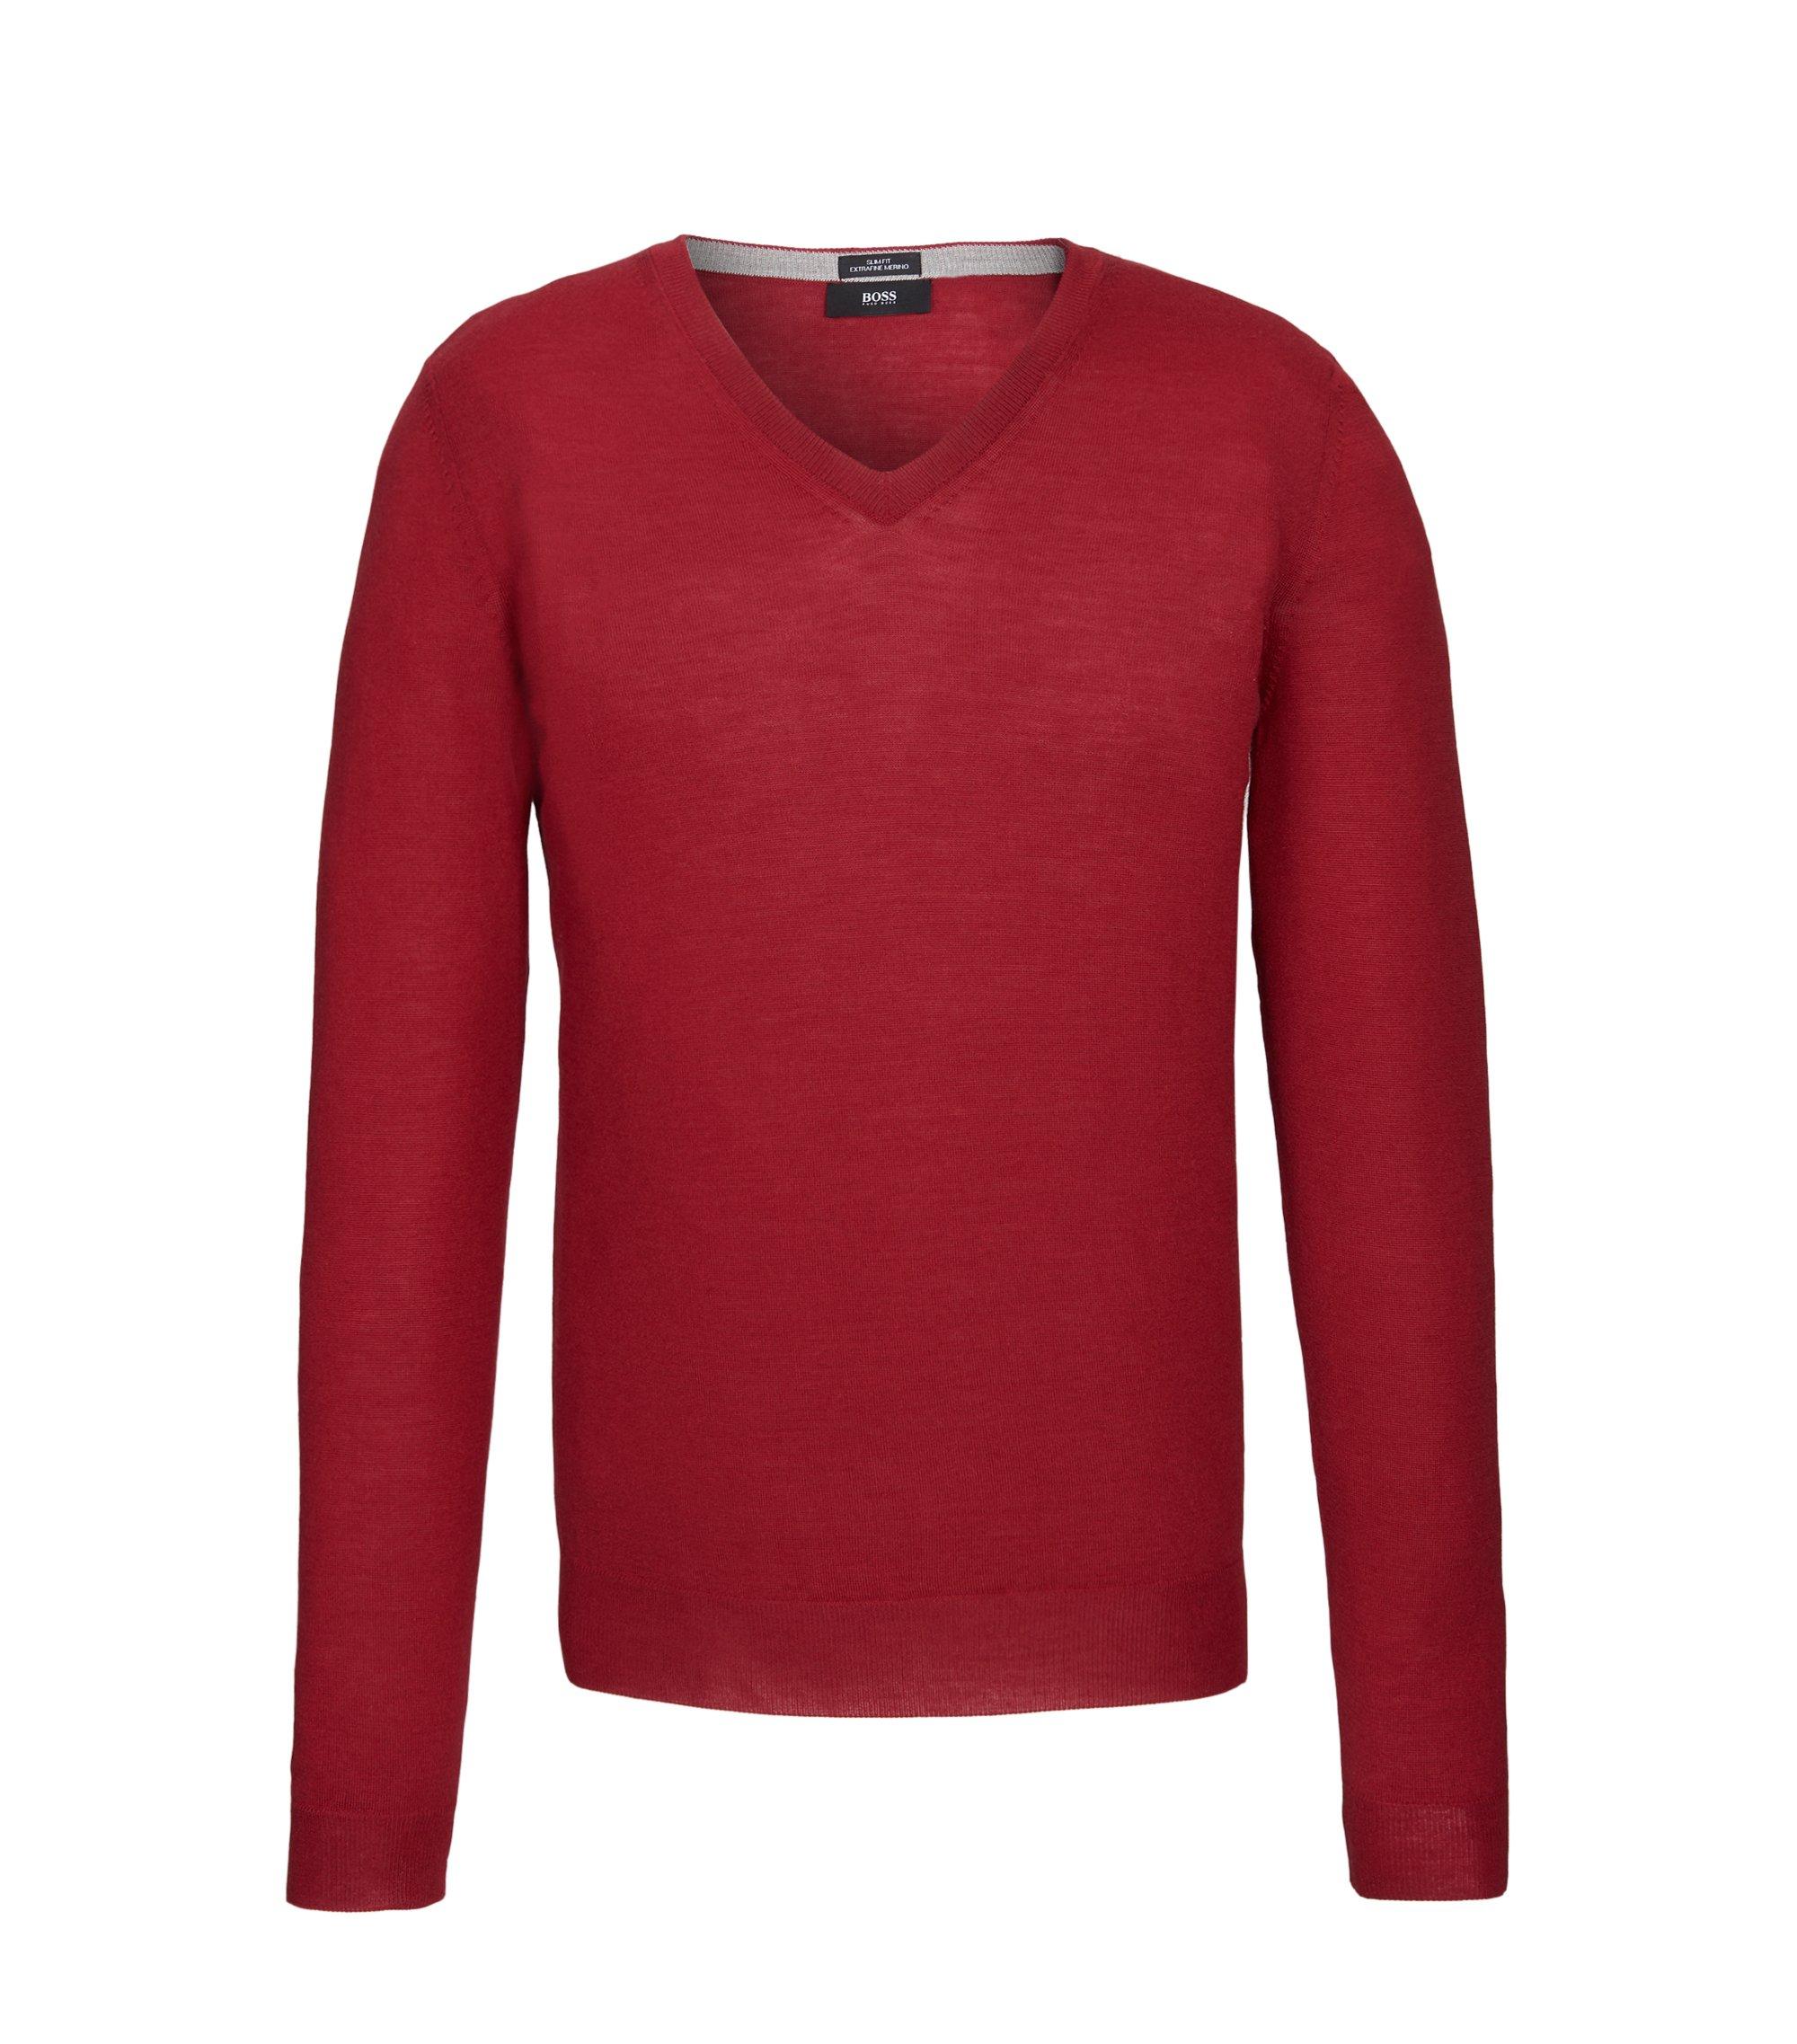 Extra-Fine Merino Wool Sweater, Slim Fit | Melba M, Red